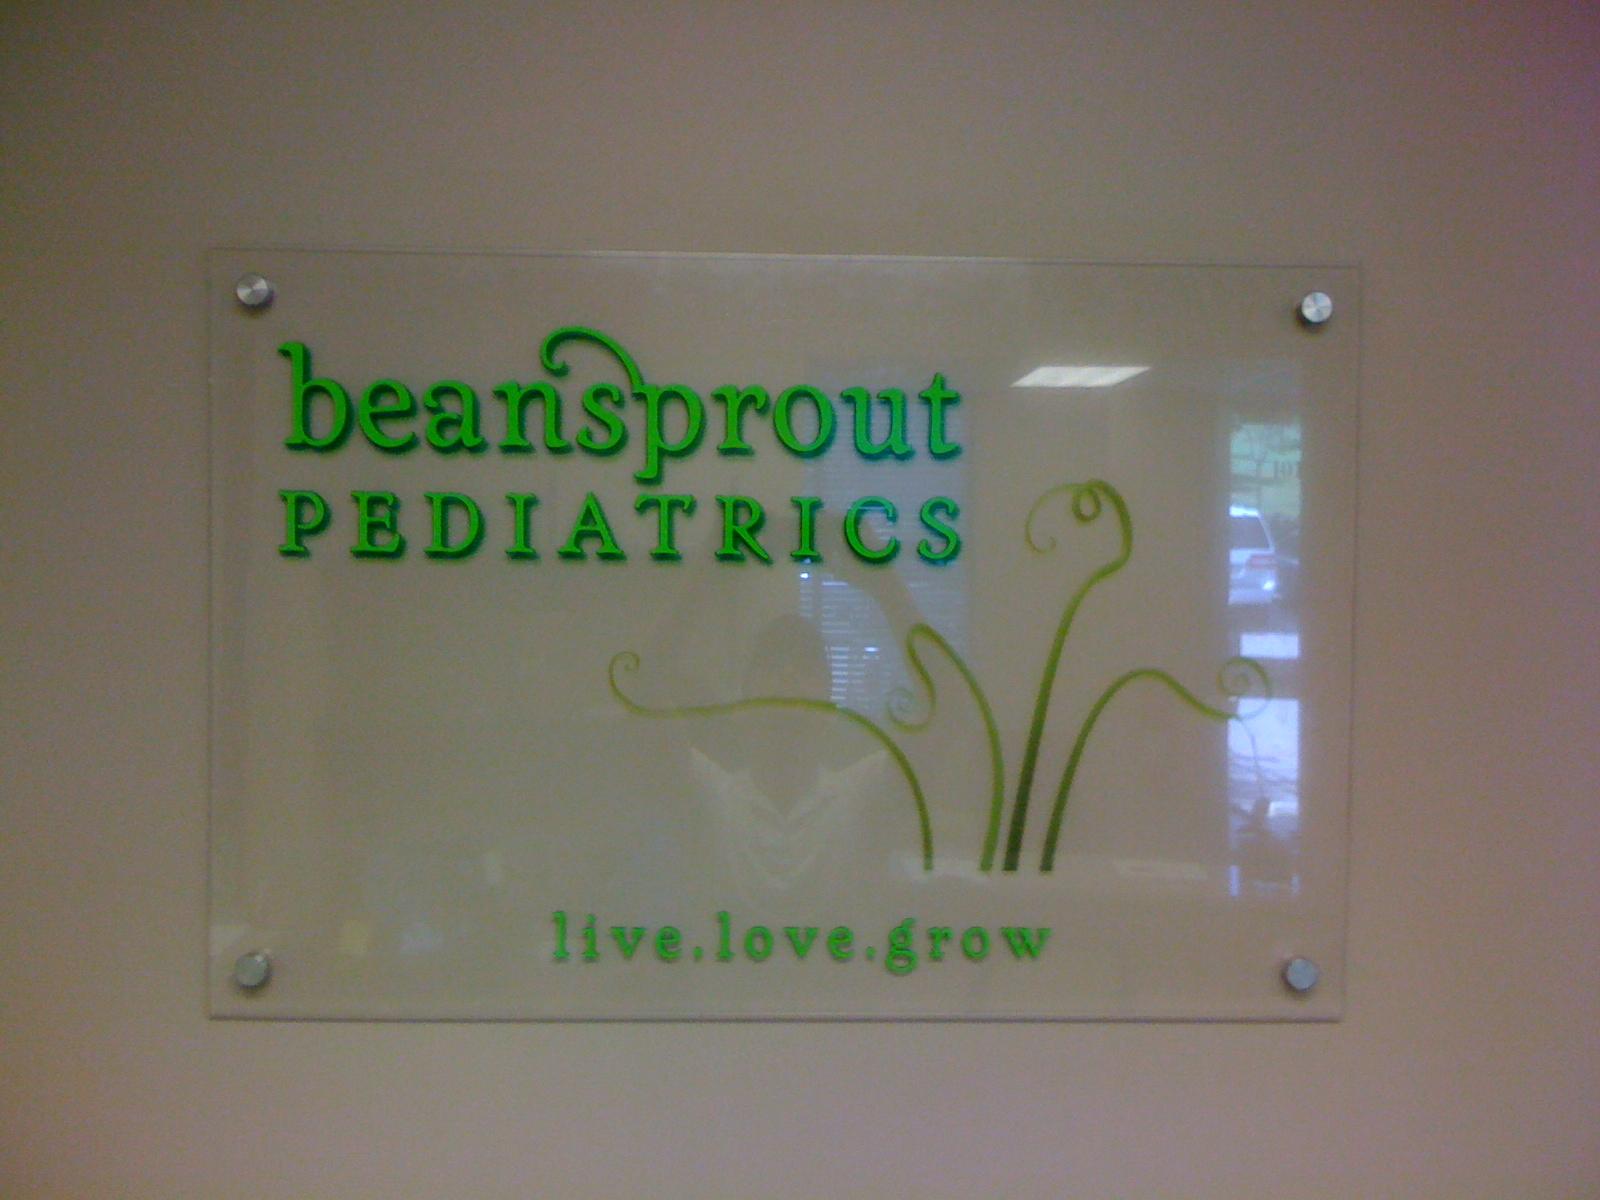 Beansprout Pediatrics.JPG